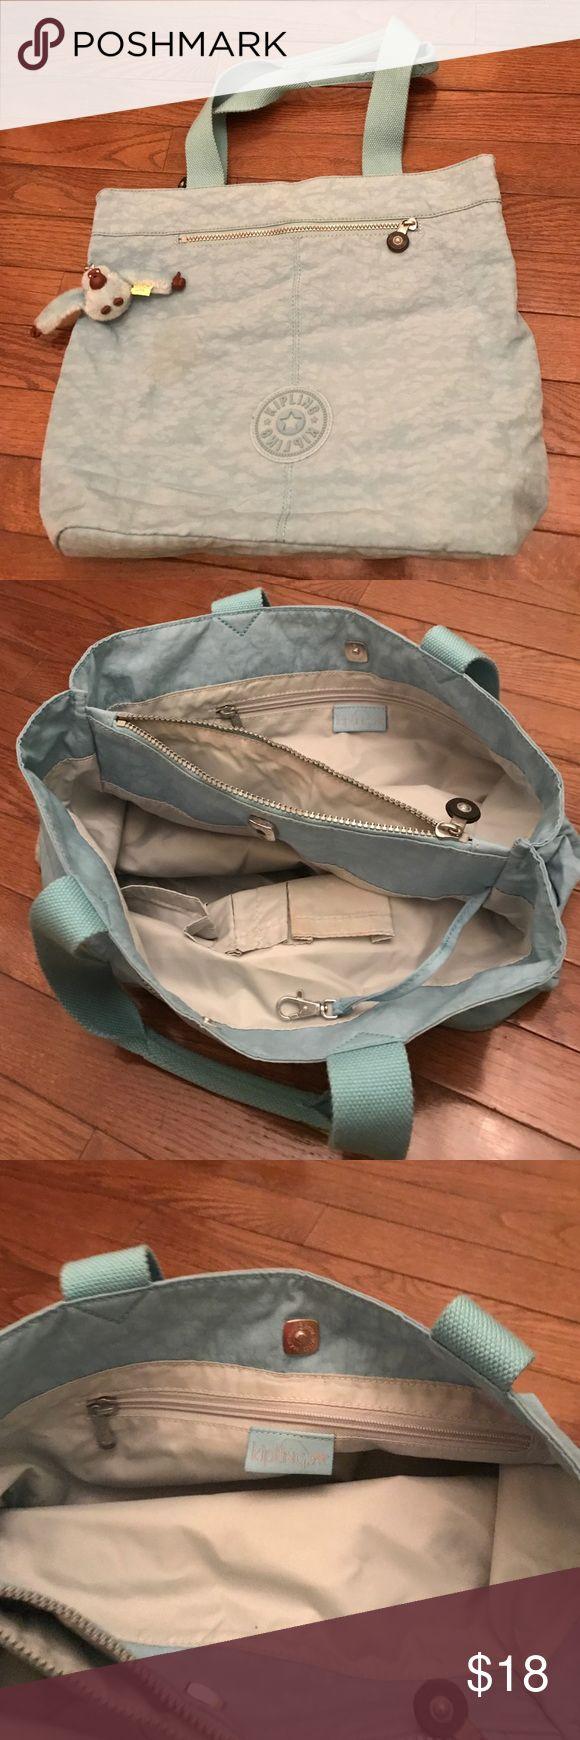 Large Kipling handbag turquoise blue Large multi packet Kipling bag, 95% new. Kipling Bags Totes